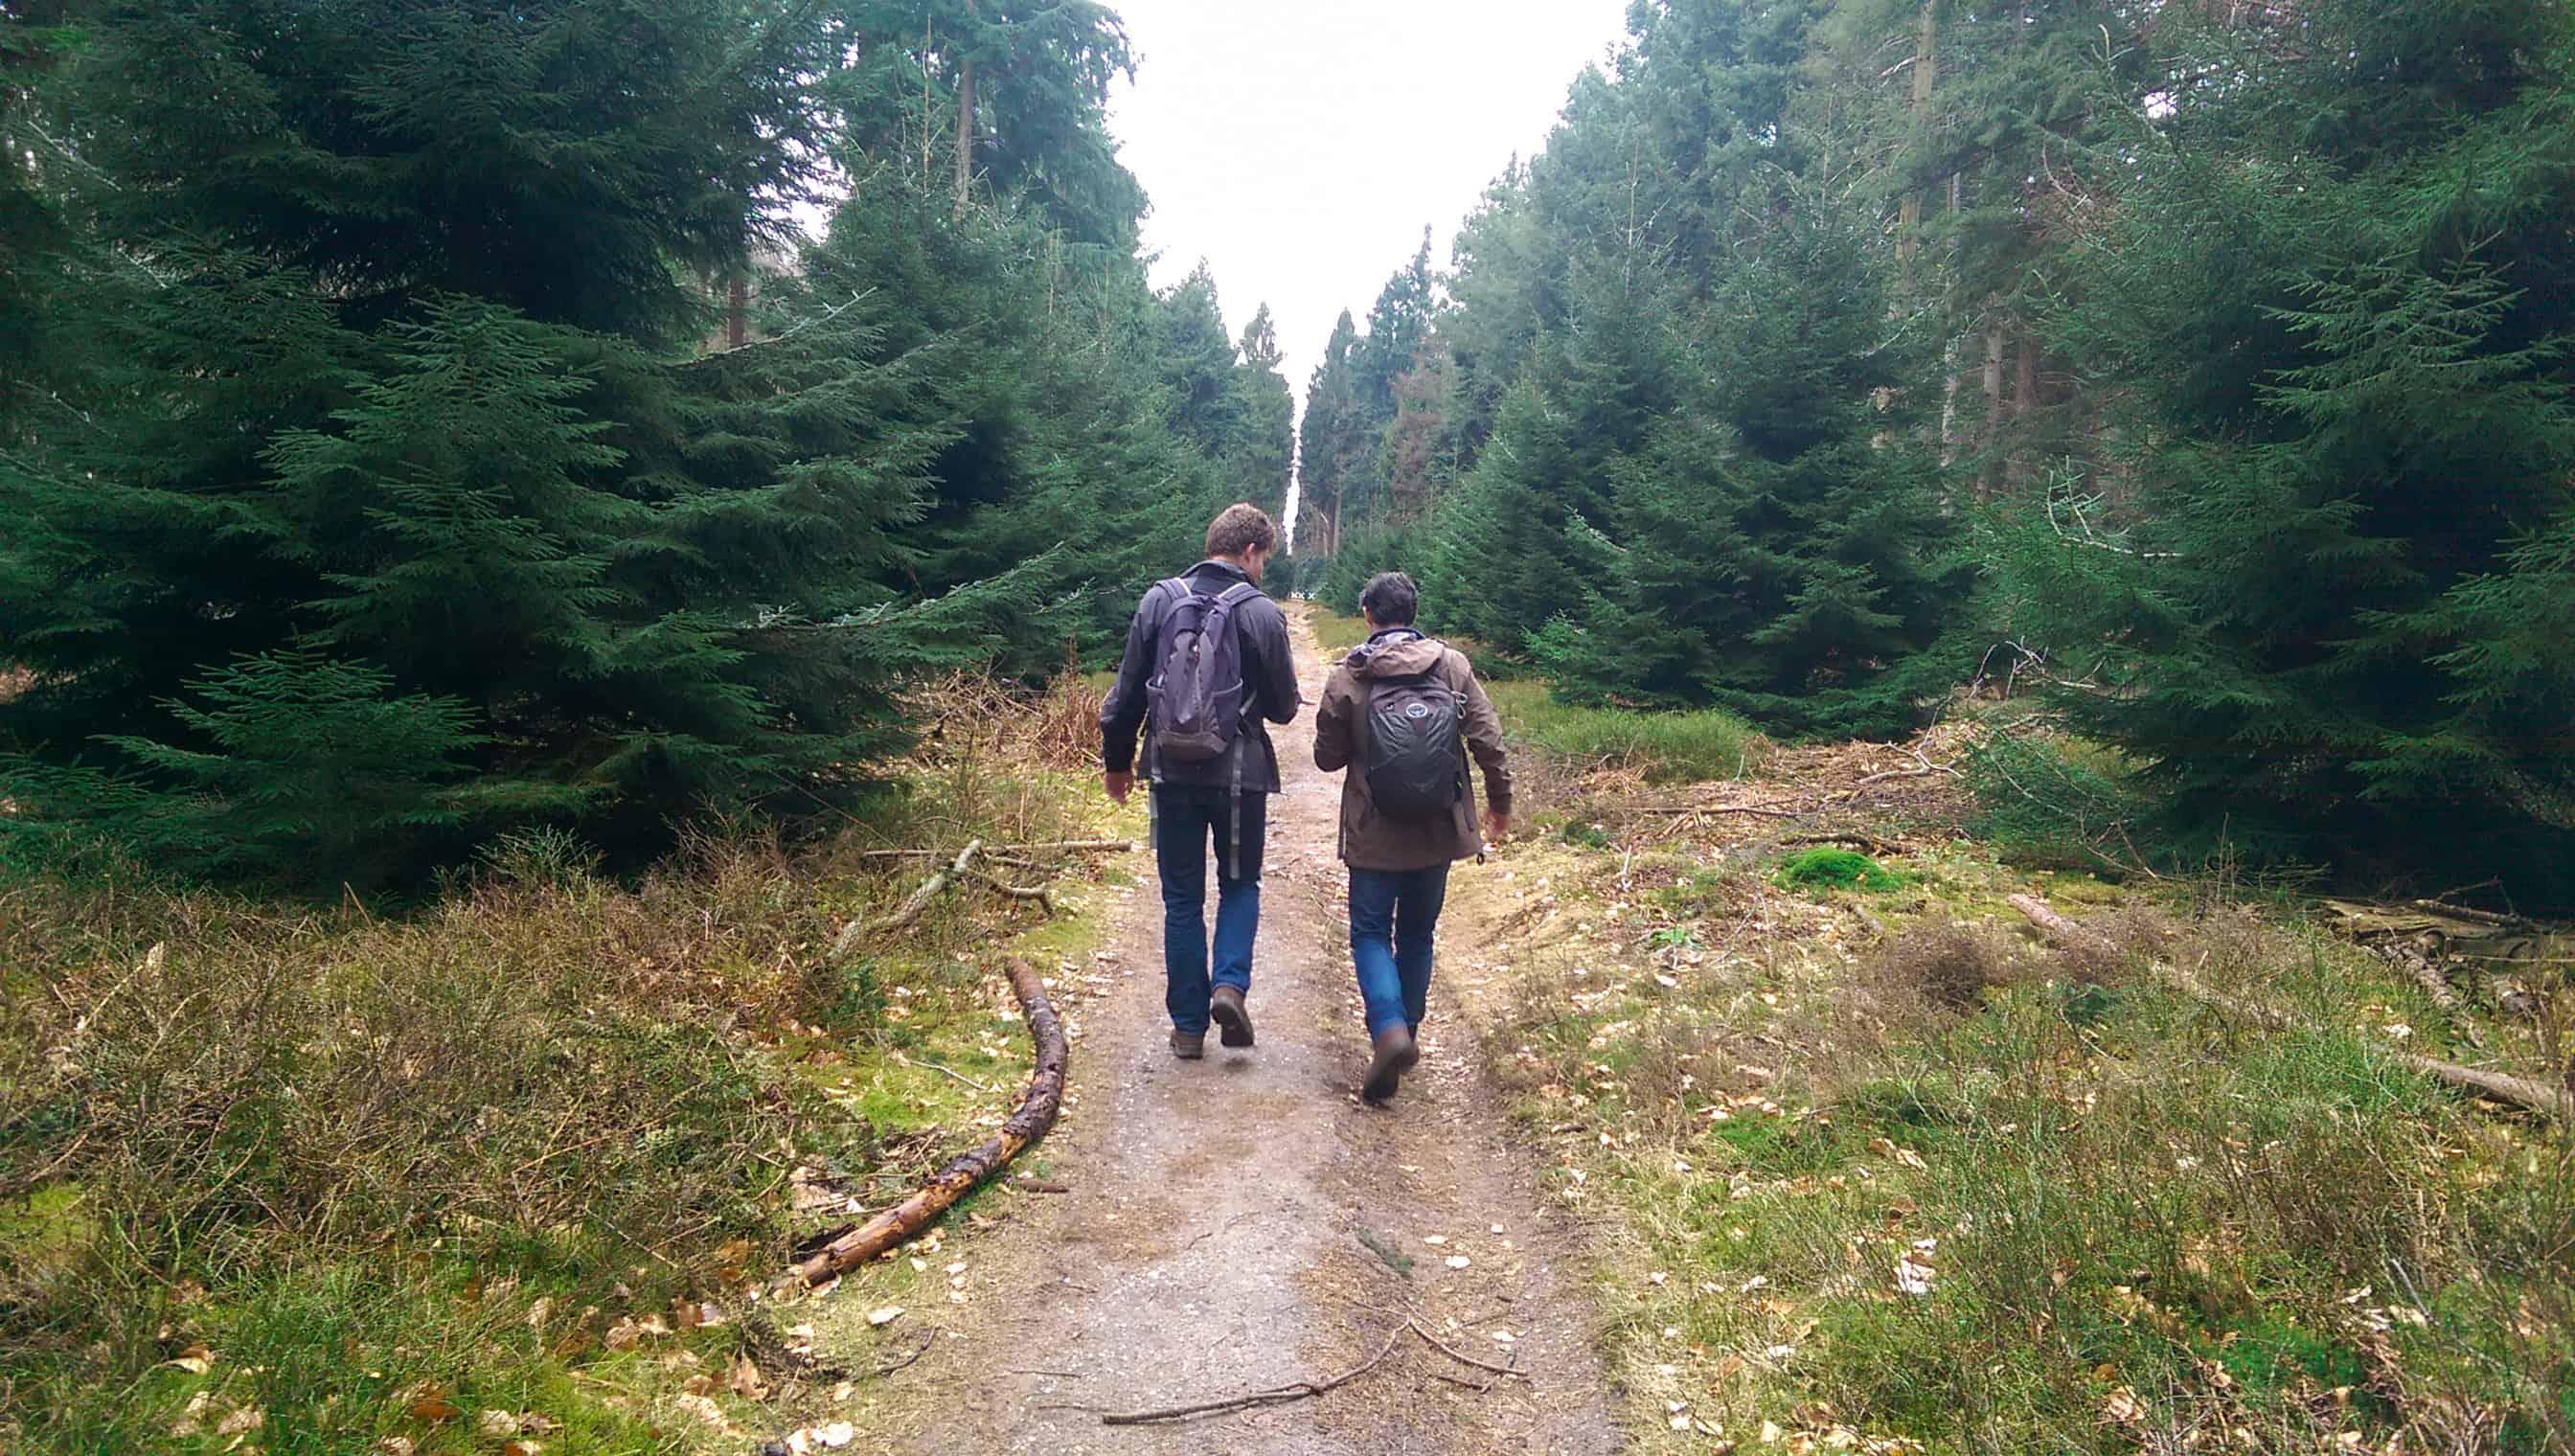 Kaapse bossen - HappyHikers